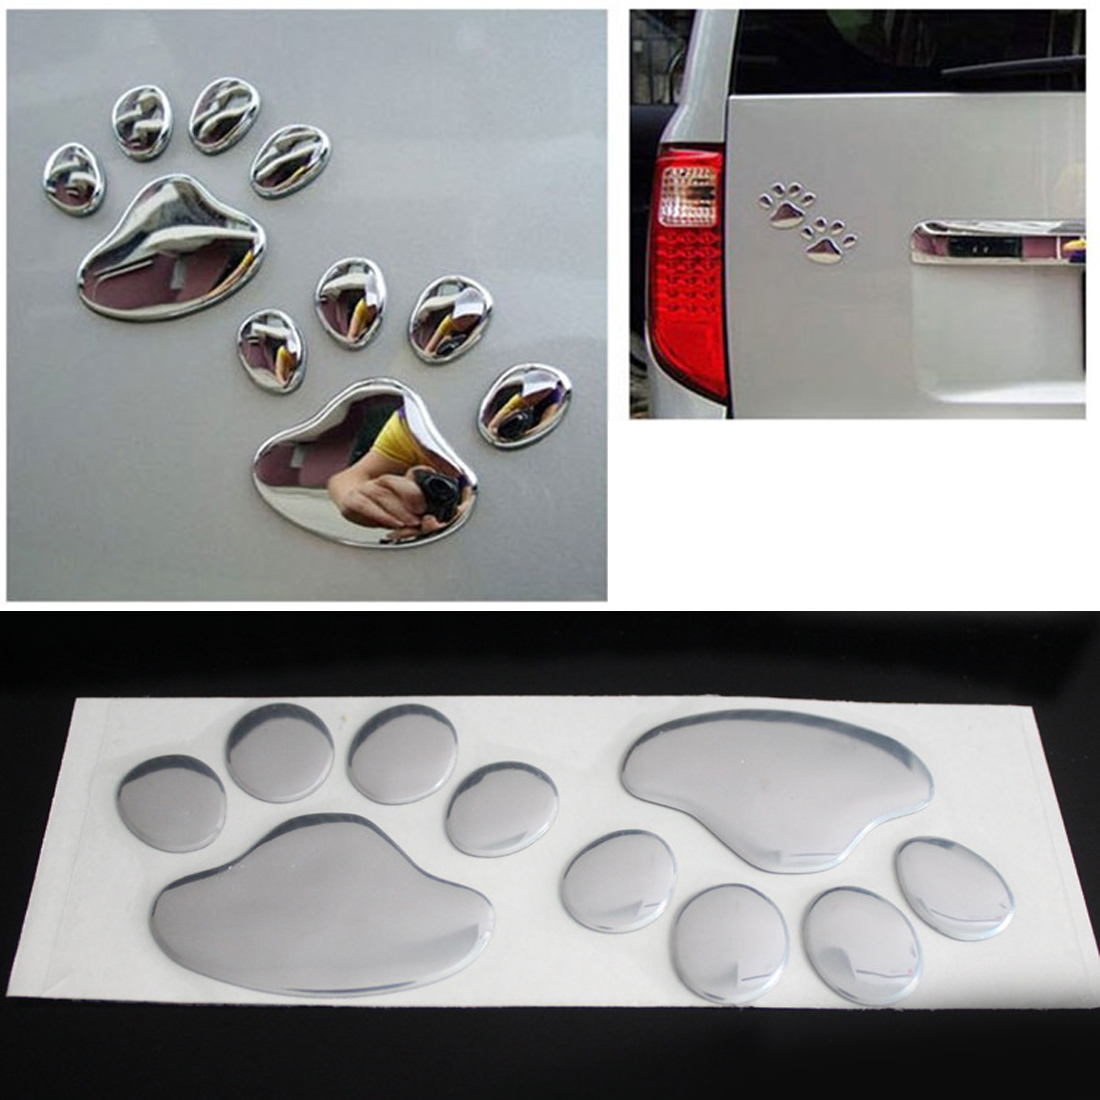 Dewtreetali Car Sticker Cool Design Paw  3D Animal Dog Cat Bear Foot Prints Footprint 3M Decal Car Stickers  Silver Gold Pair